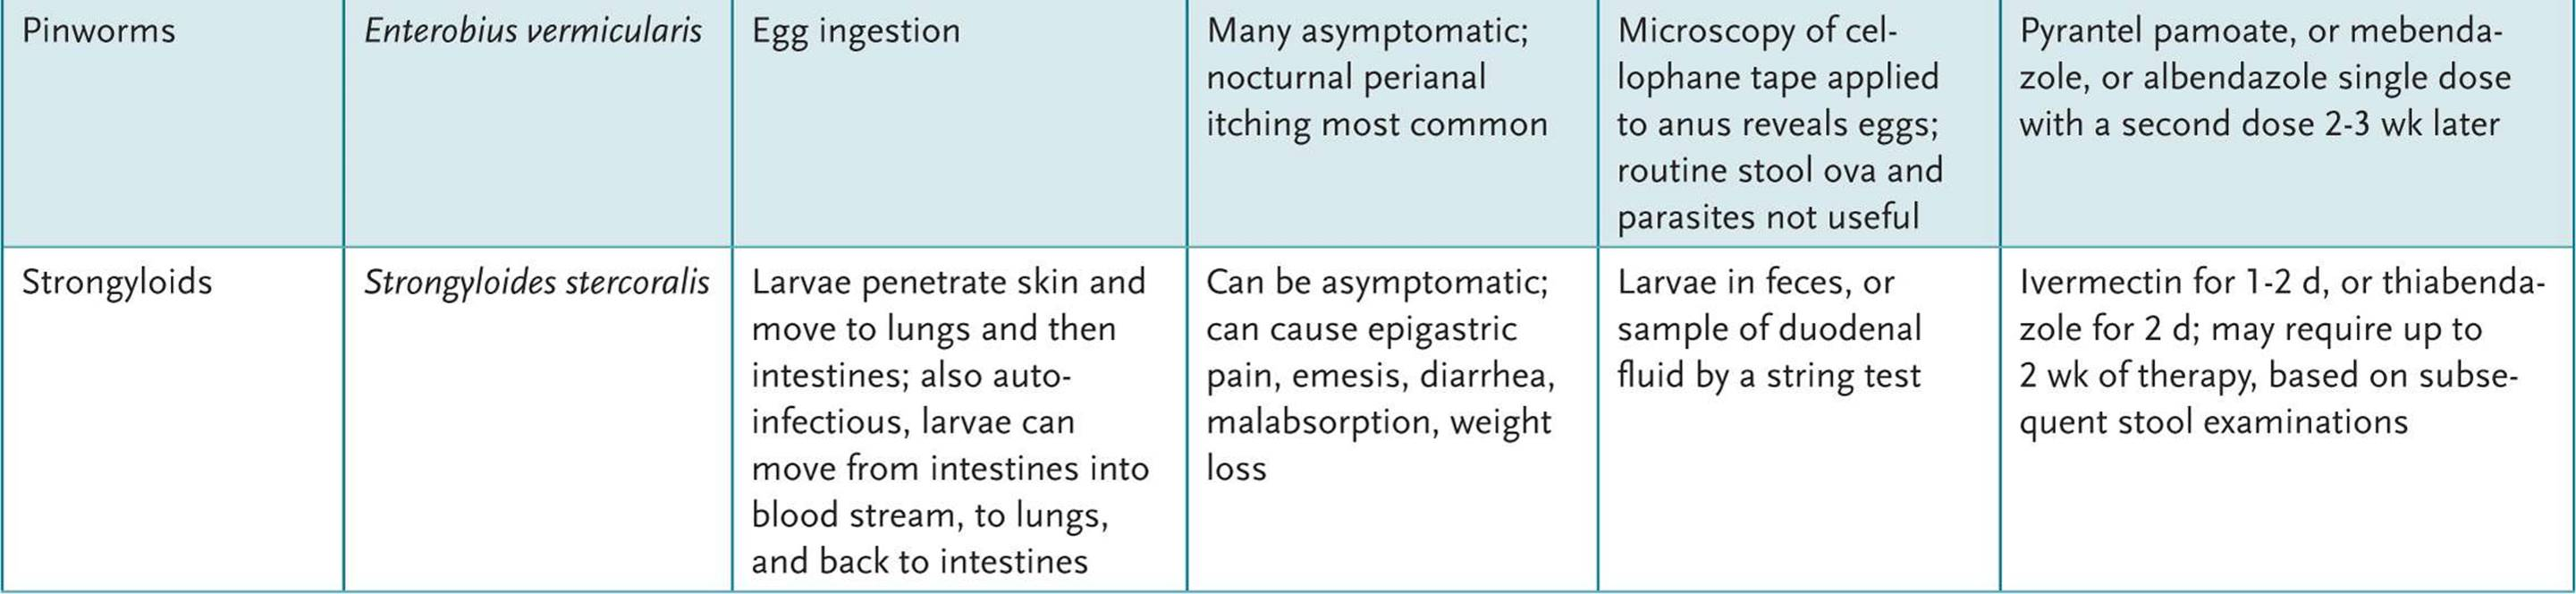 enterobius vermicularis treatment dosage hpv high risk genital warts